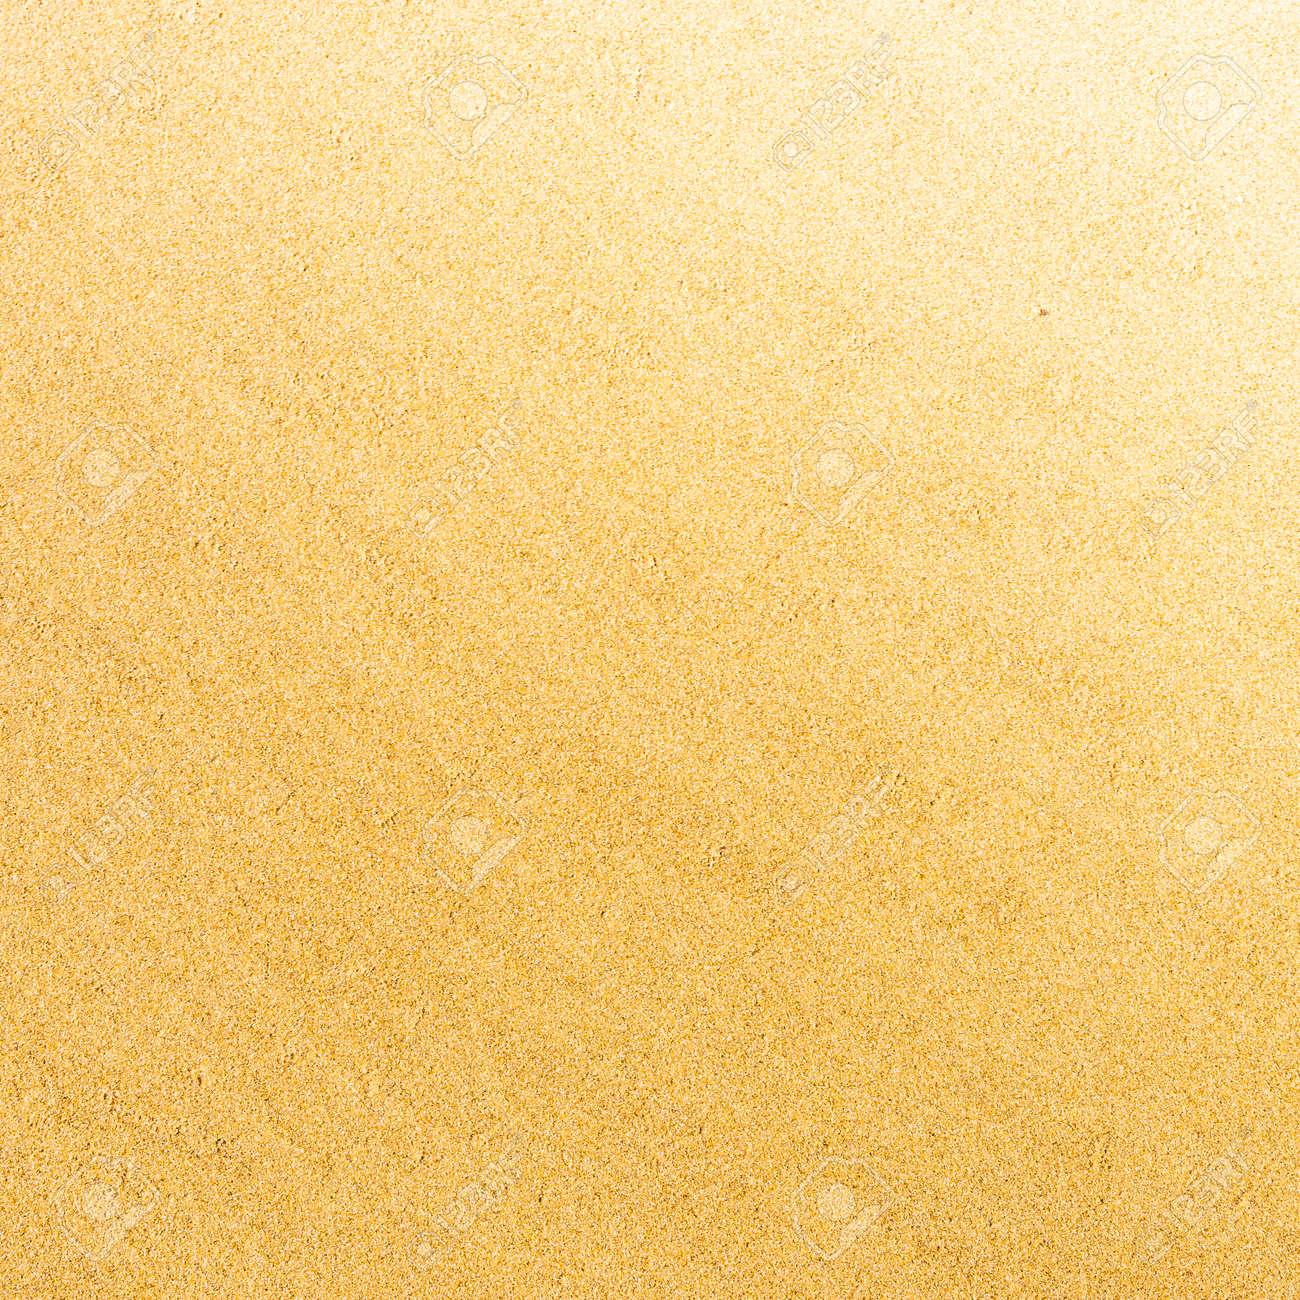 Sand background textures - Vintage effect and sun flare filter processing Standard-Bild - 37539719